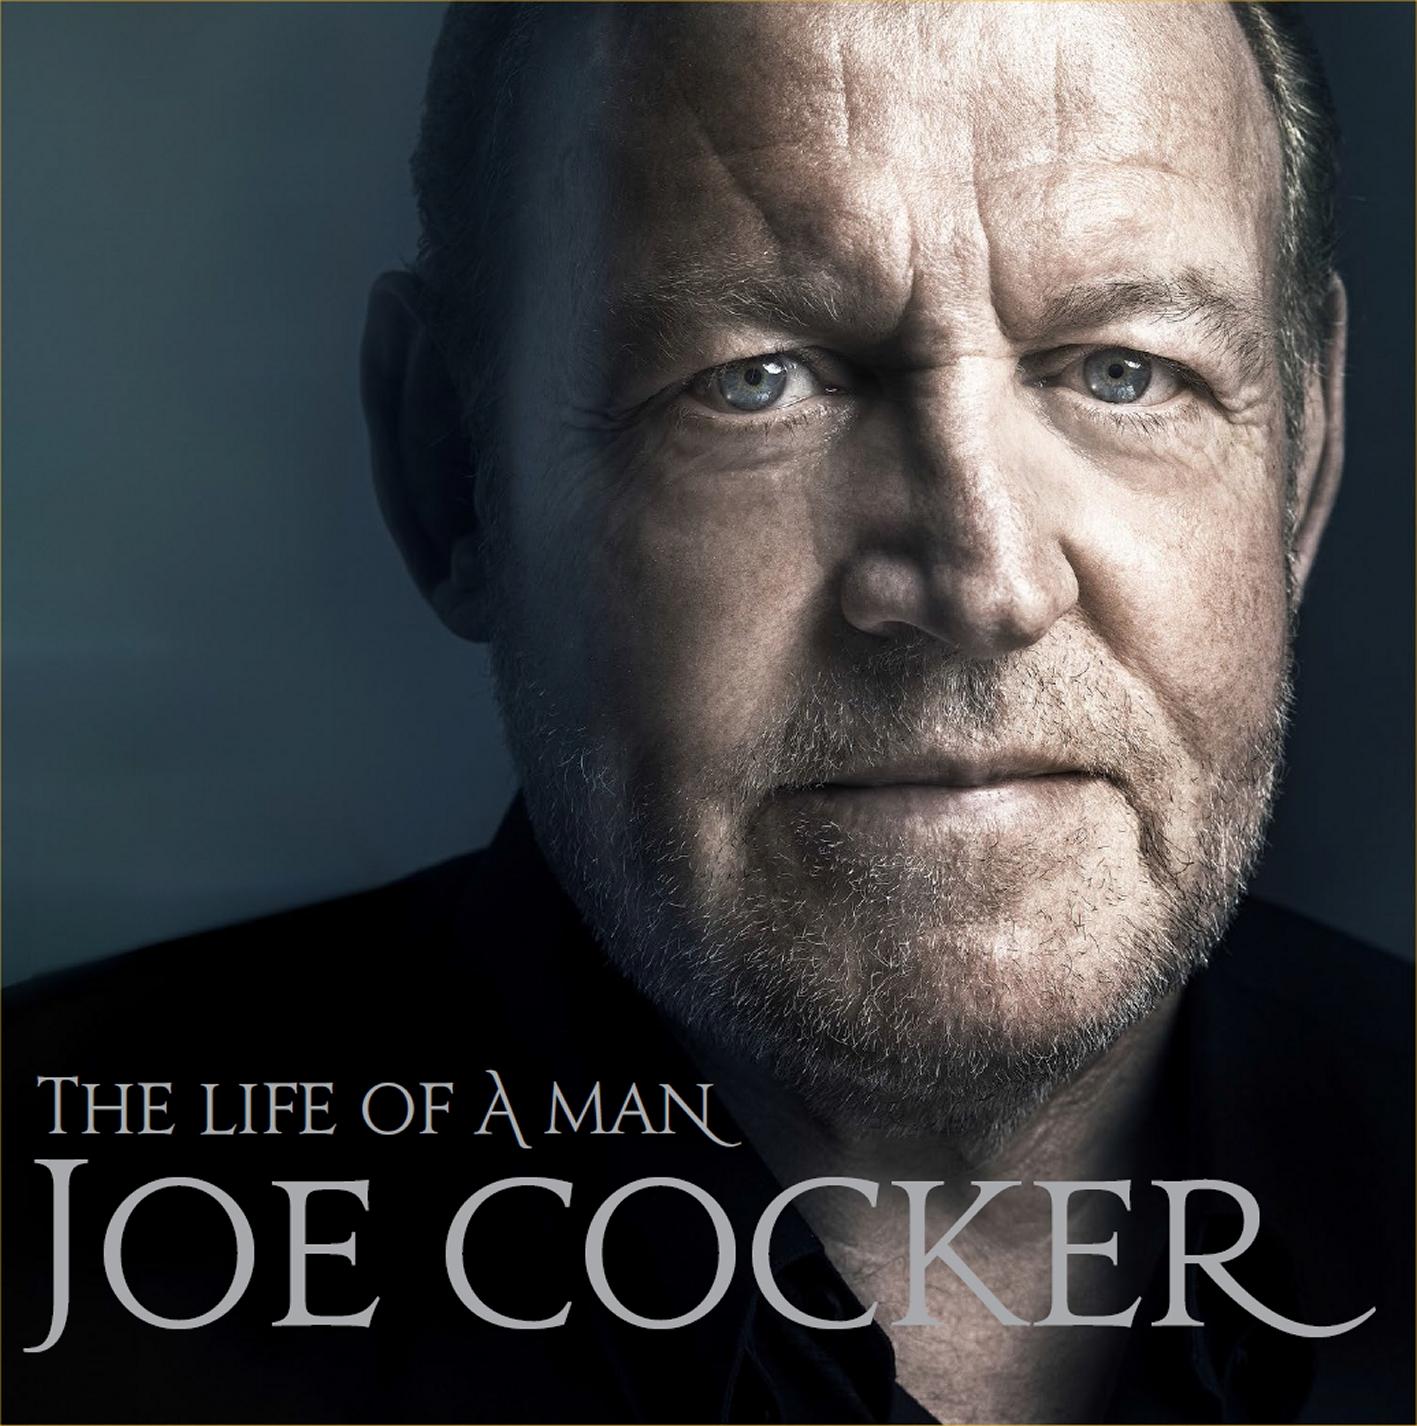 Joe_Cocker_The_Life_Of_A_Man